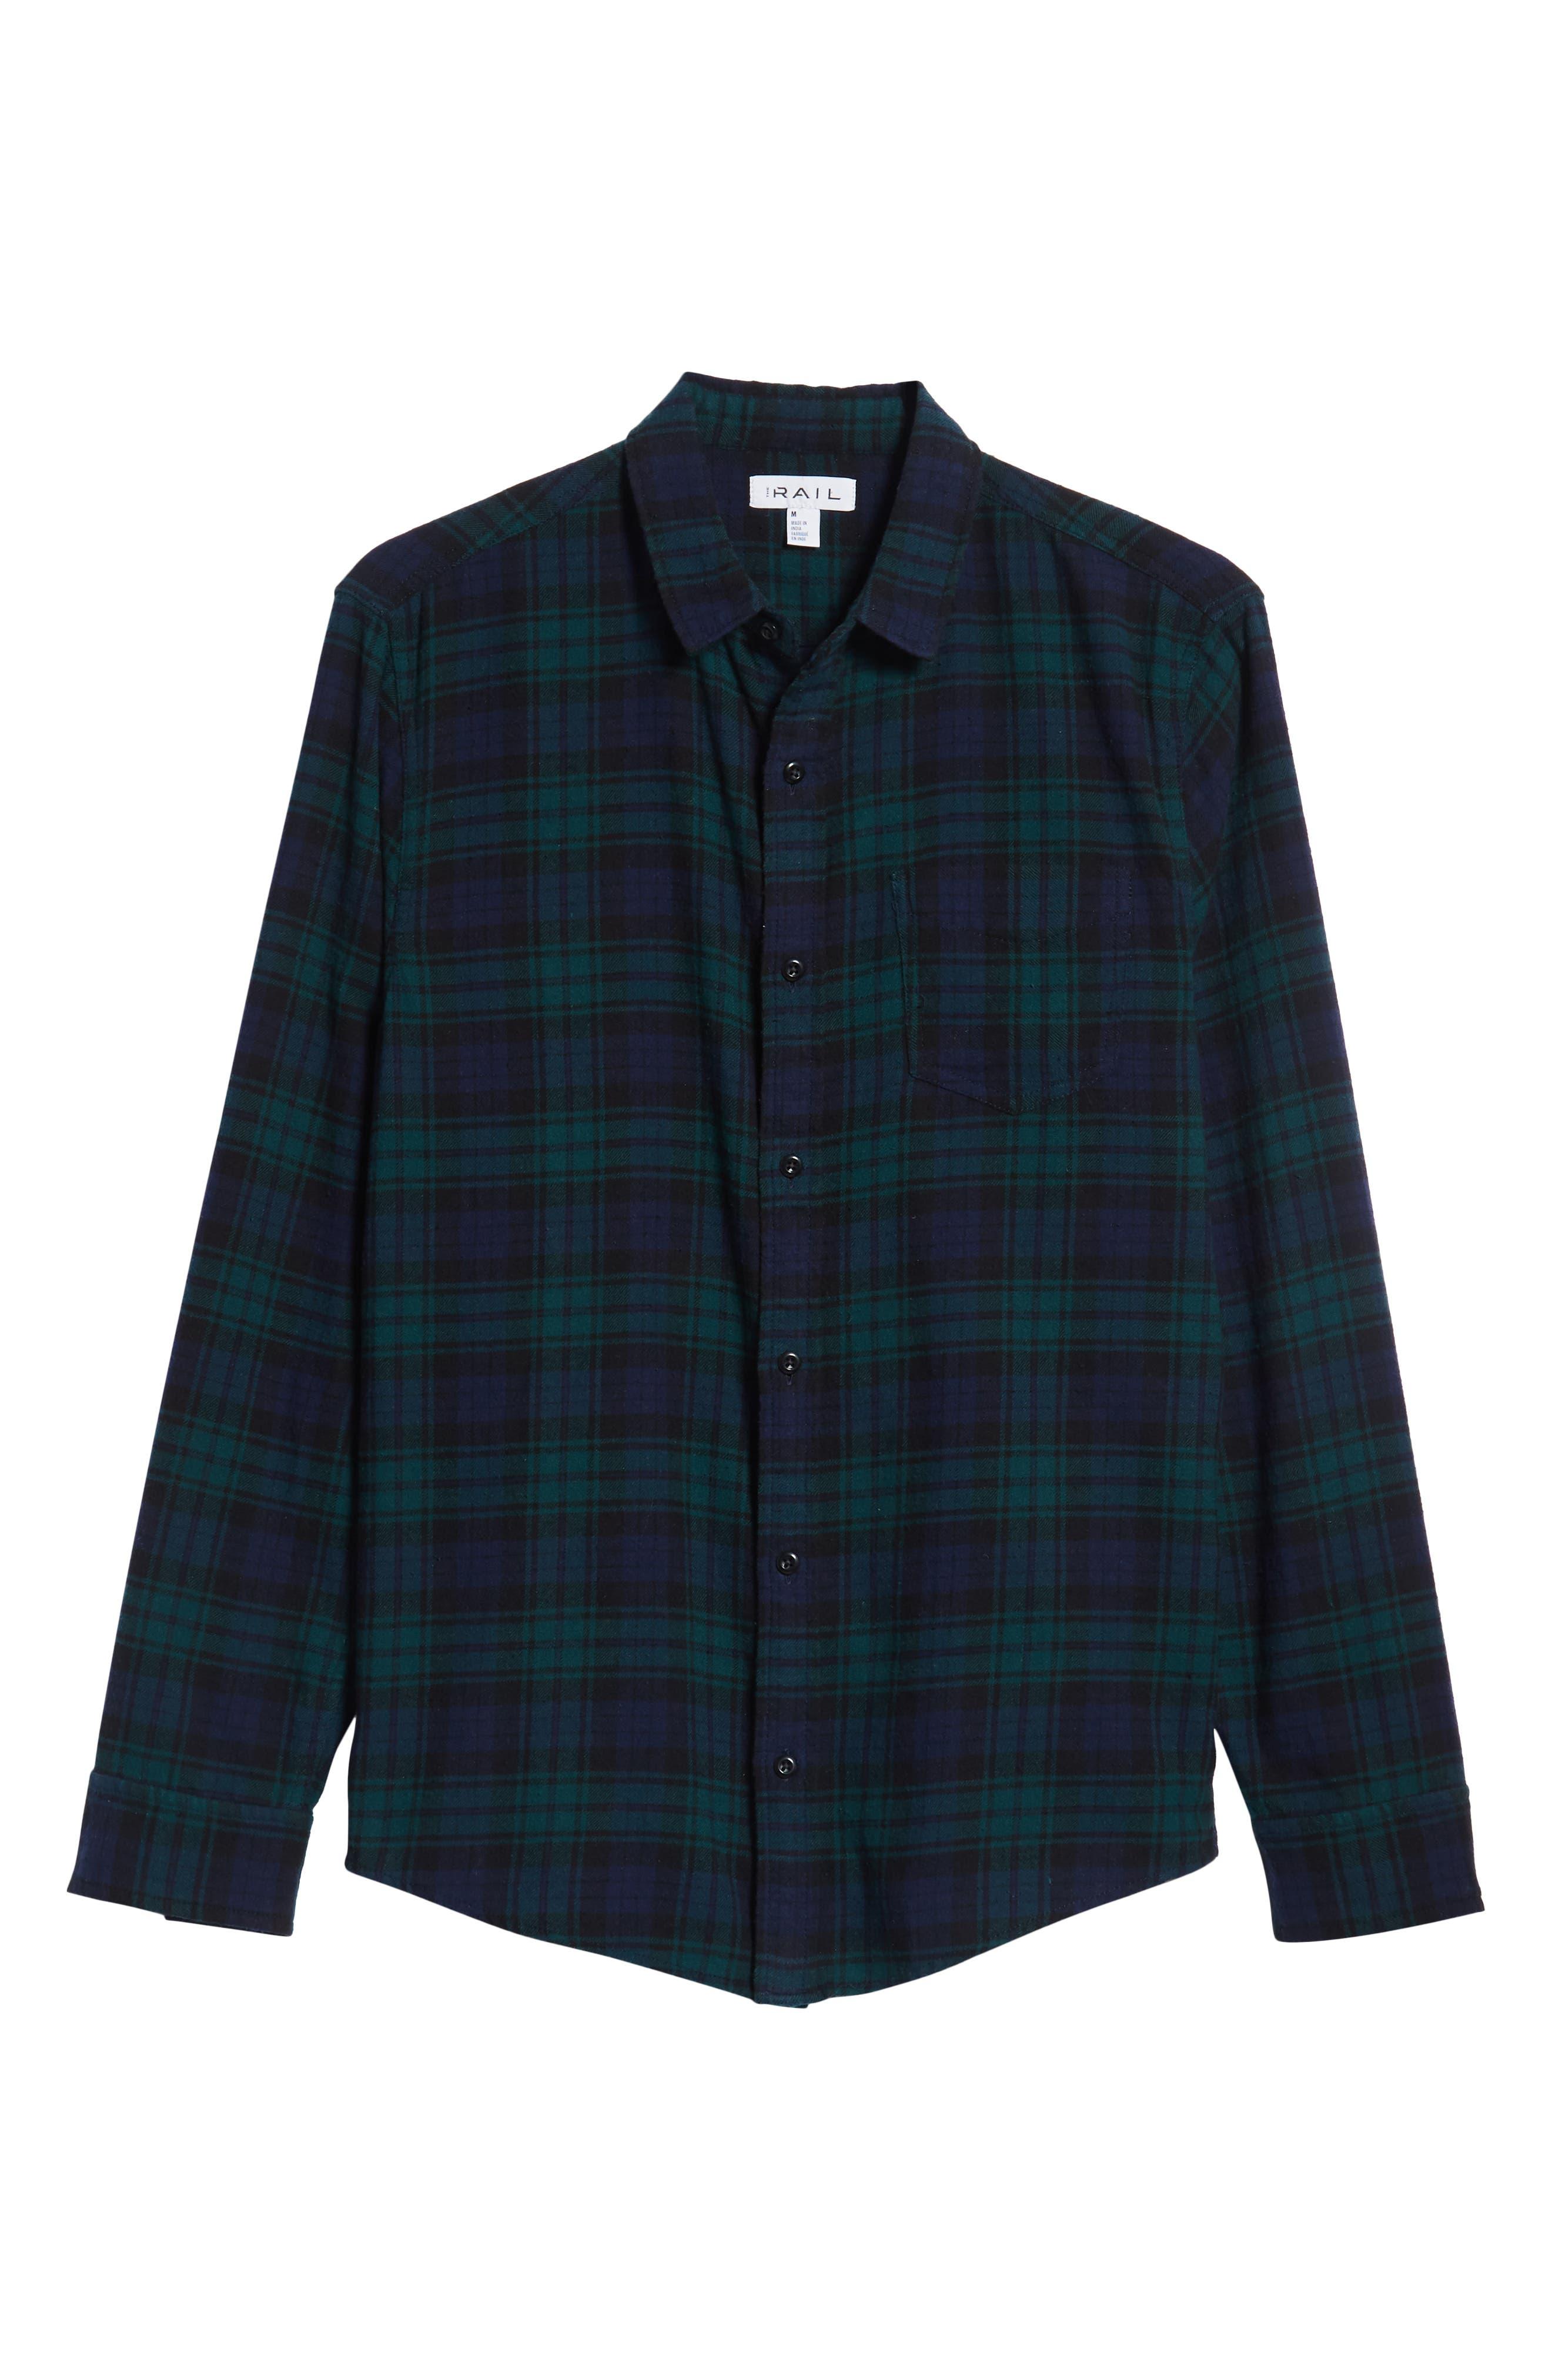 Flannel Shirt,                             Alternate thumbnail 6, color,                             BLUE GREEN CLASSIC PLAID